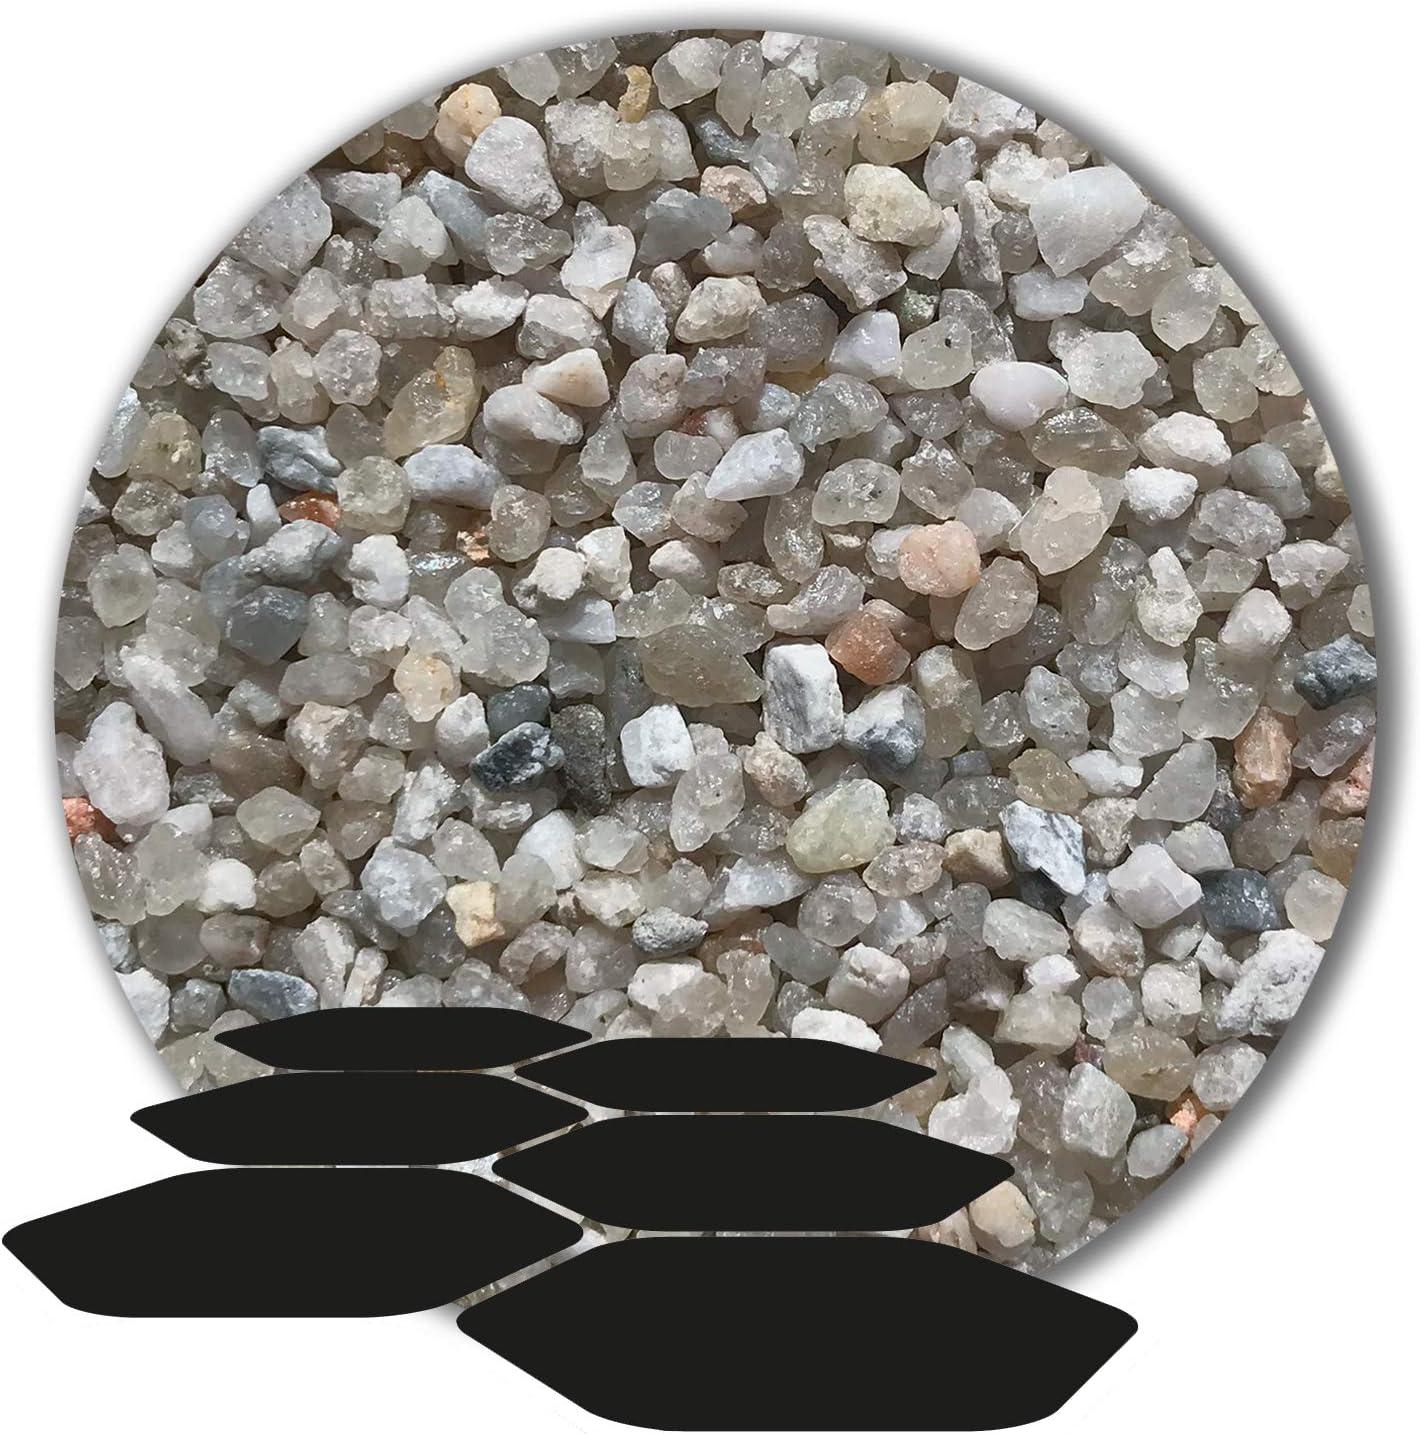 25 kg Fugensand Einkehrsand Quarzsand grau hellgrau 15 K/örnungen 3,15-5,6 mm